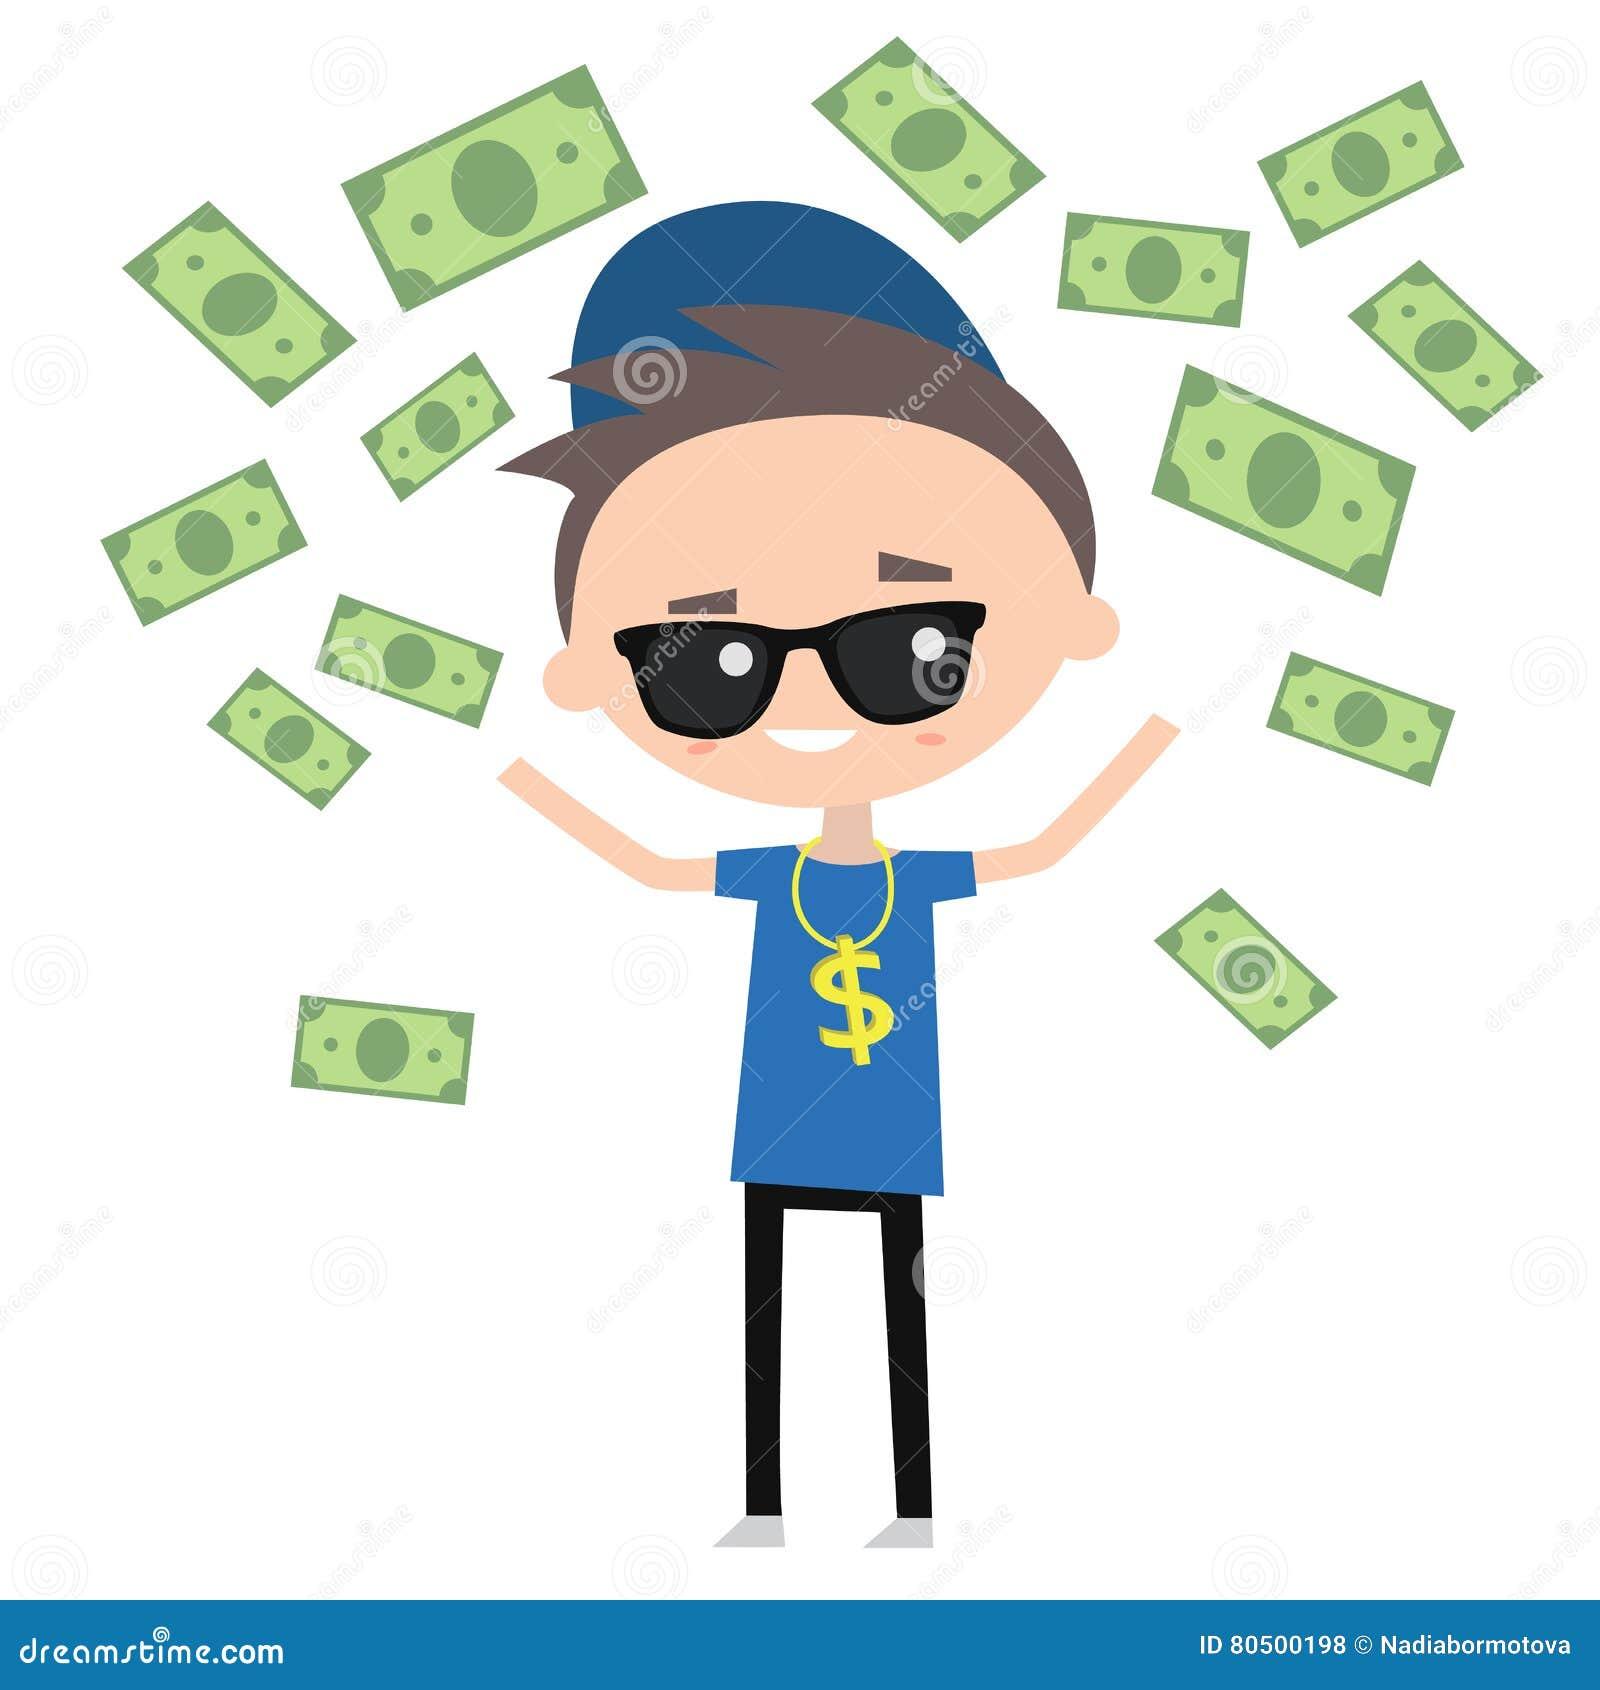 Rich boy clipart